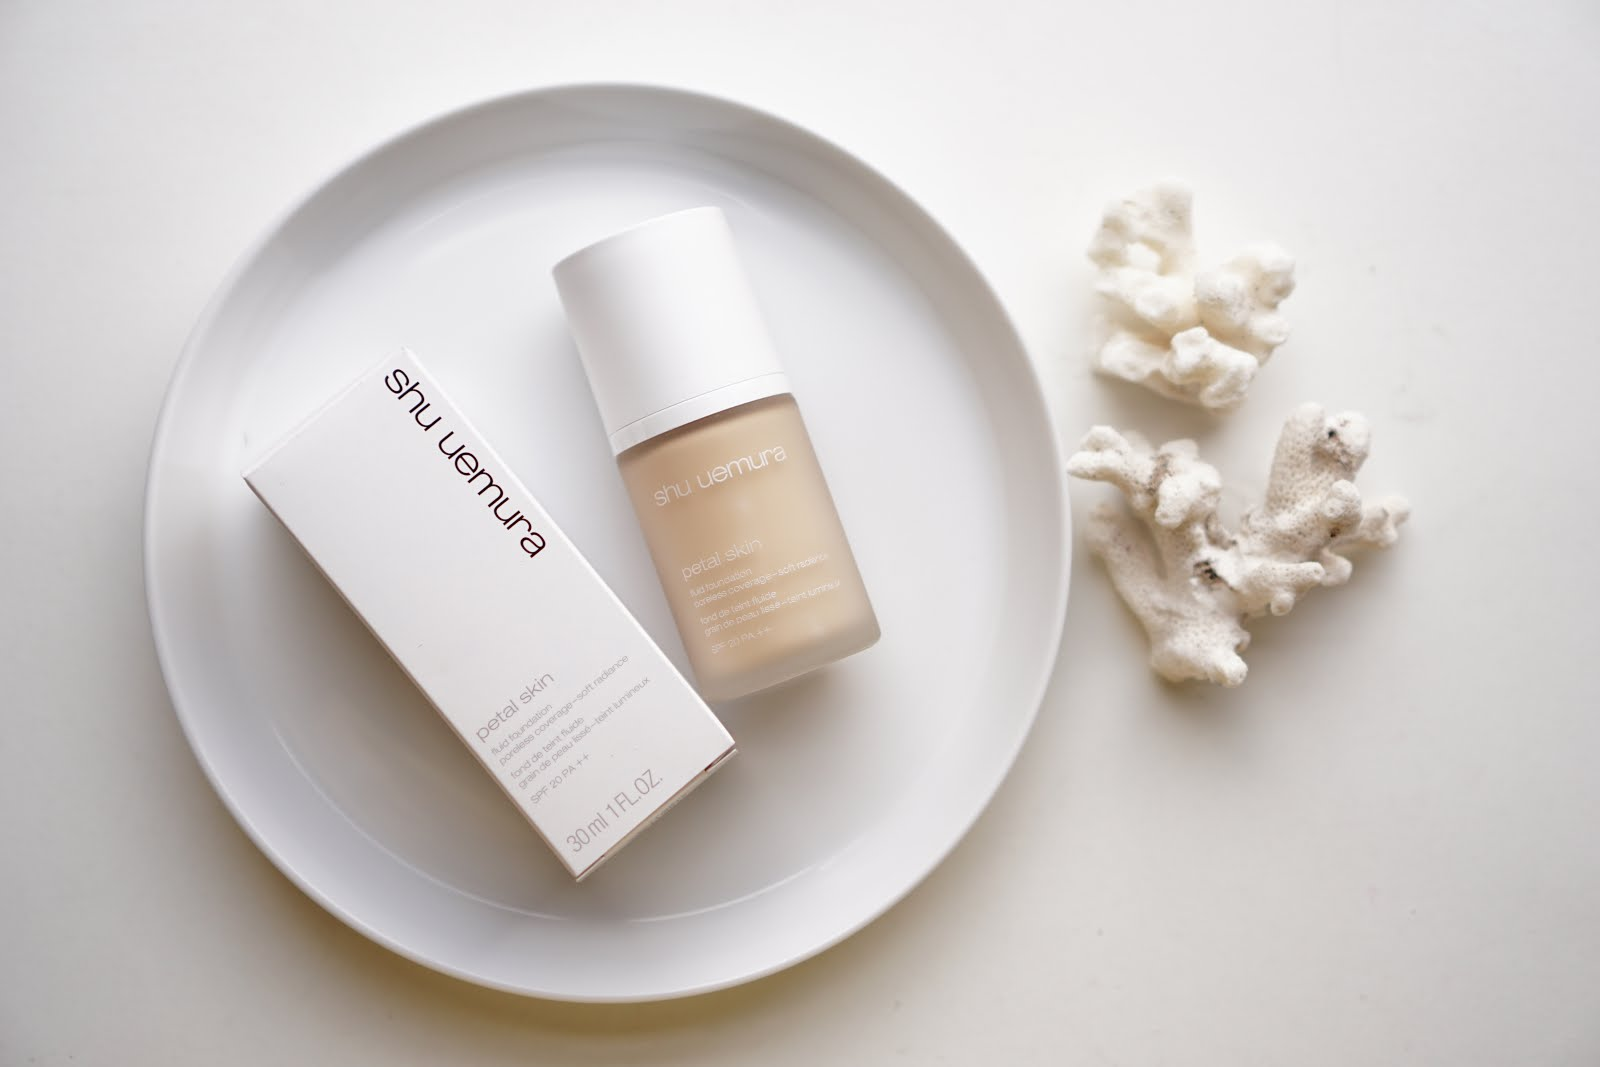 Shu Uemura Petal Skin Liquid Foundation Vs Petal Skin Cushion